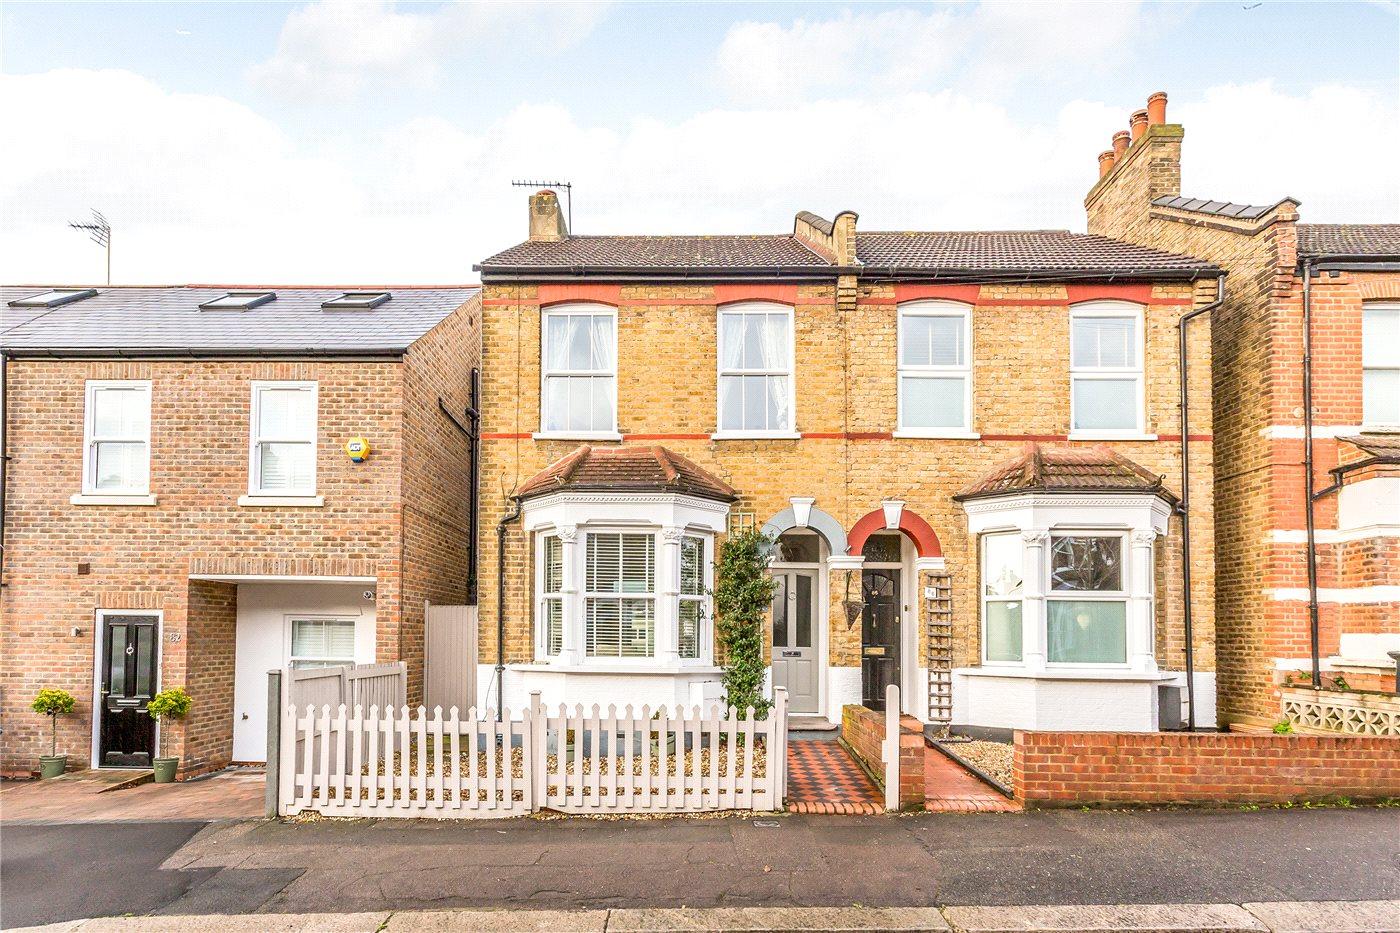 3 Bedrooms Semi Detached House for sale in Birkbeck Road, Enfield, EN2